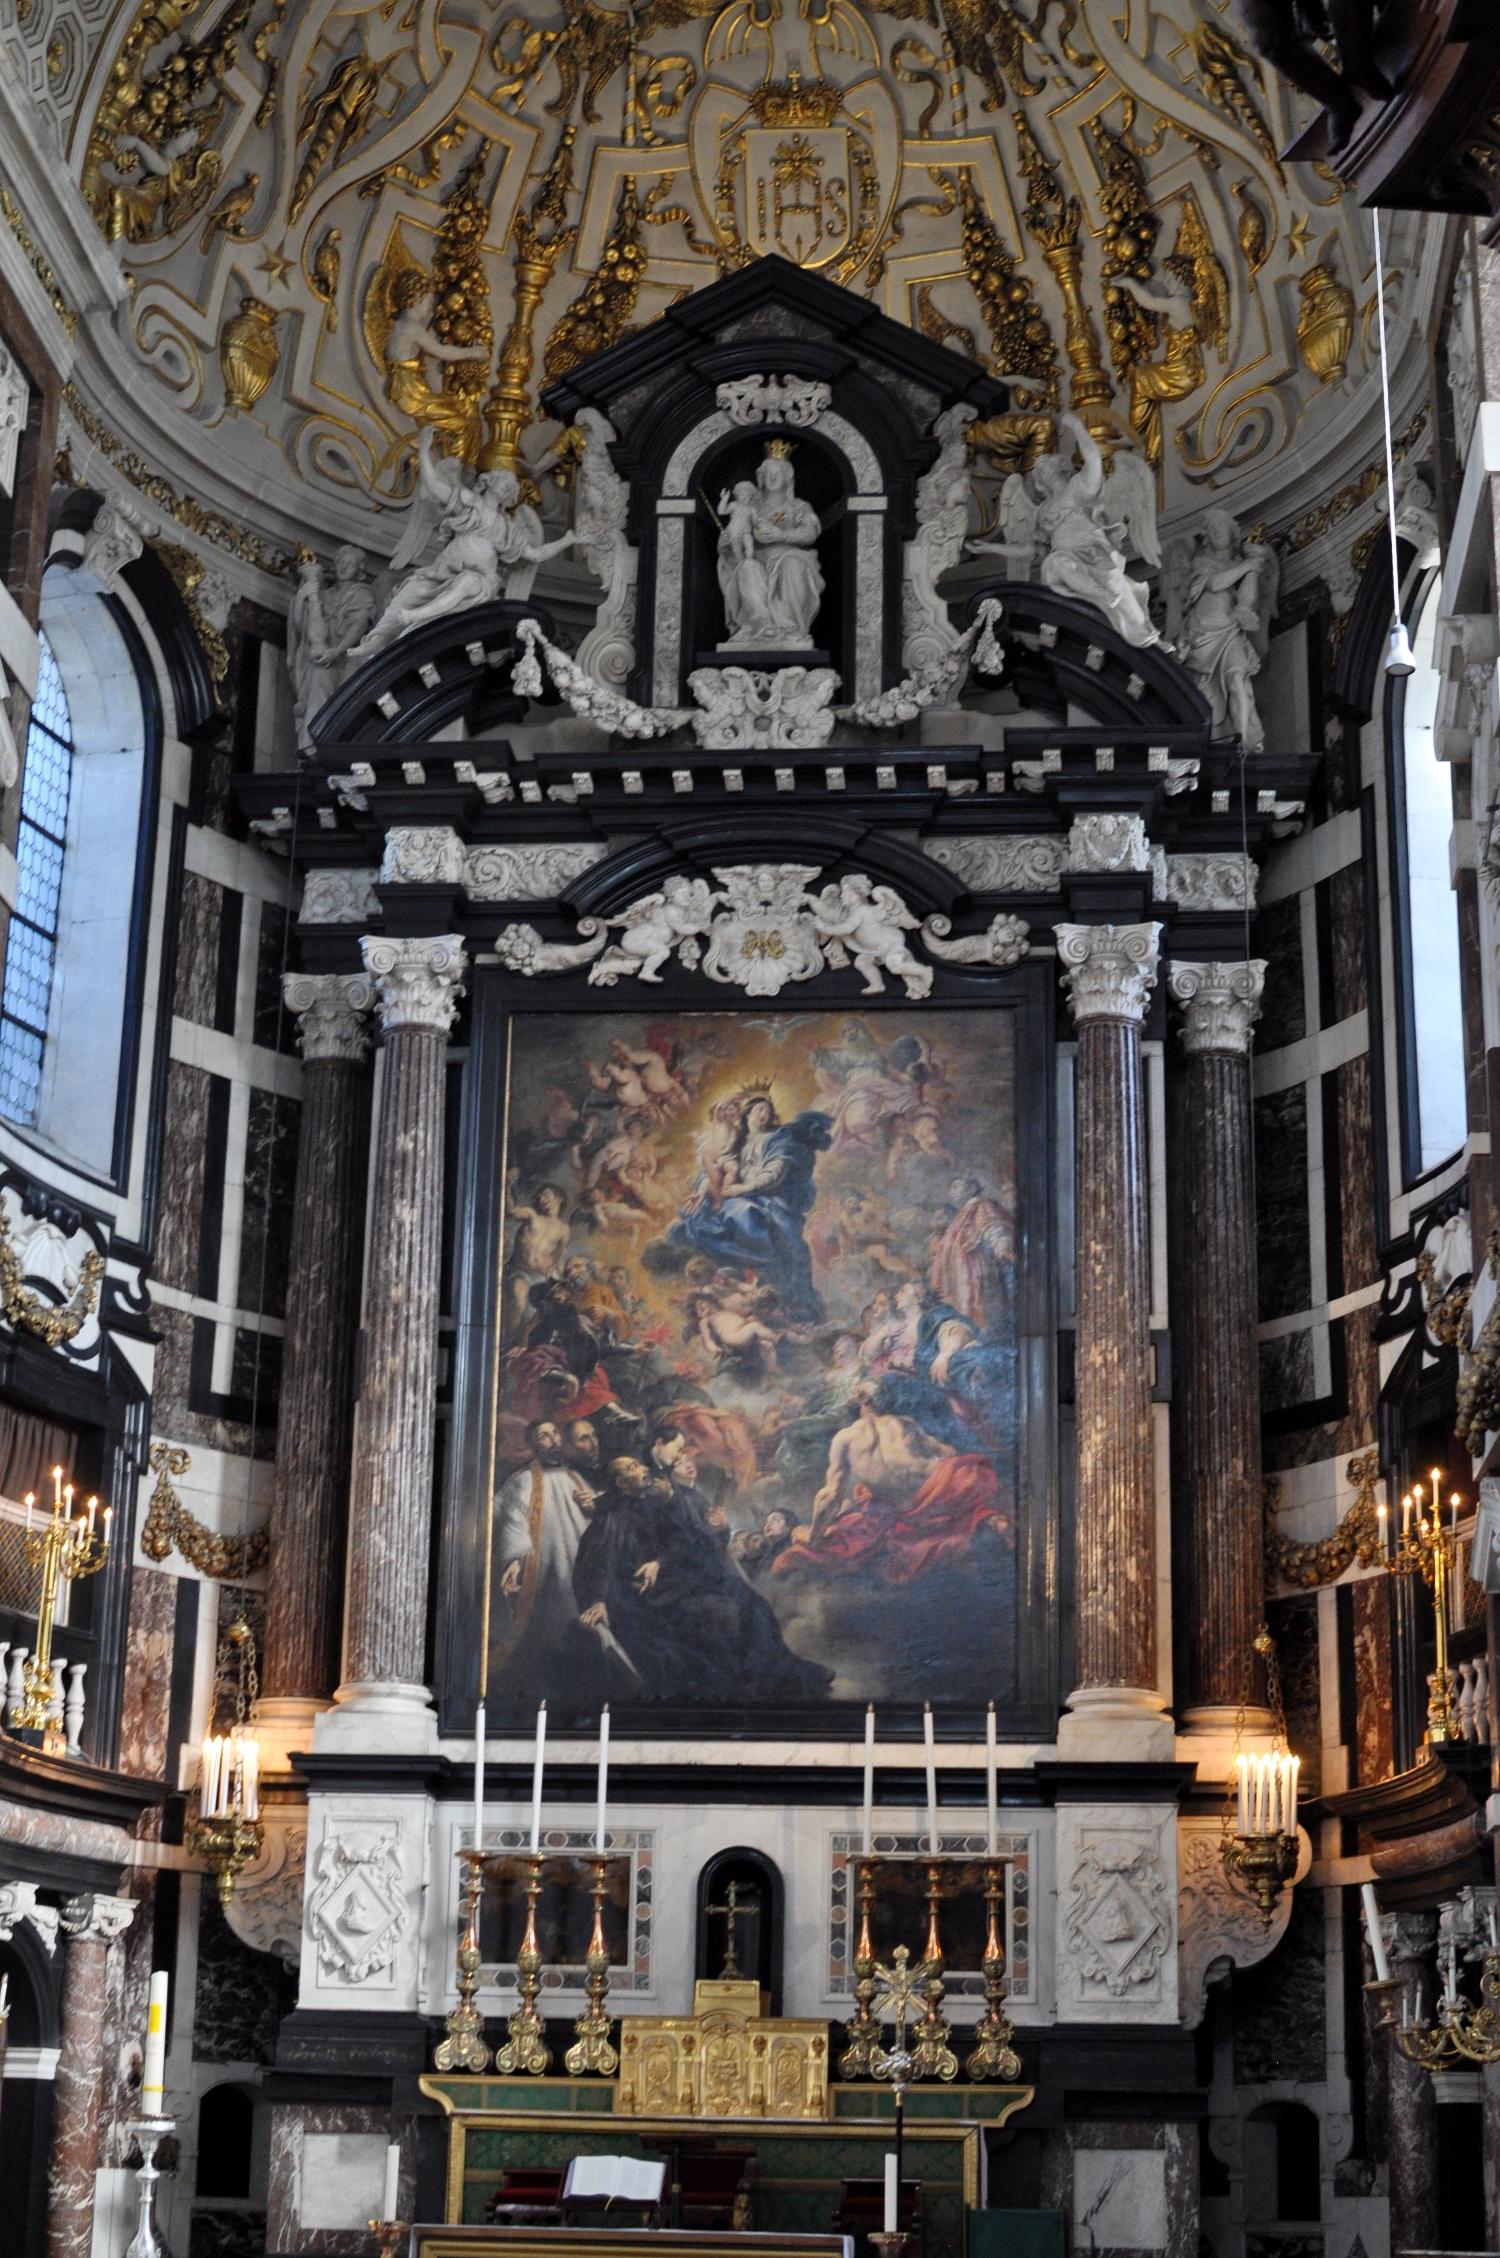 rocaille-blog-chiesa-san-carlo-borromeo-anversa-Carolus-Borromeuskerk-antwerpen-fiandre-2